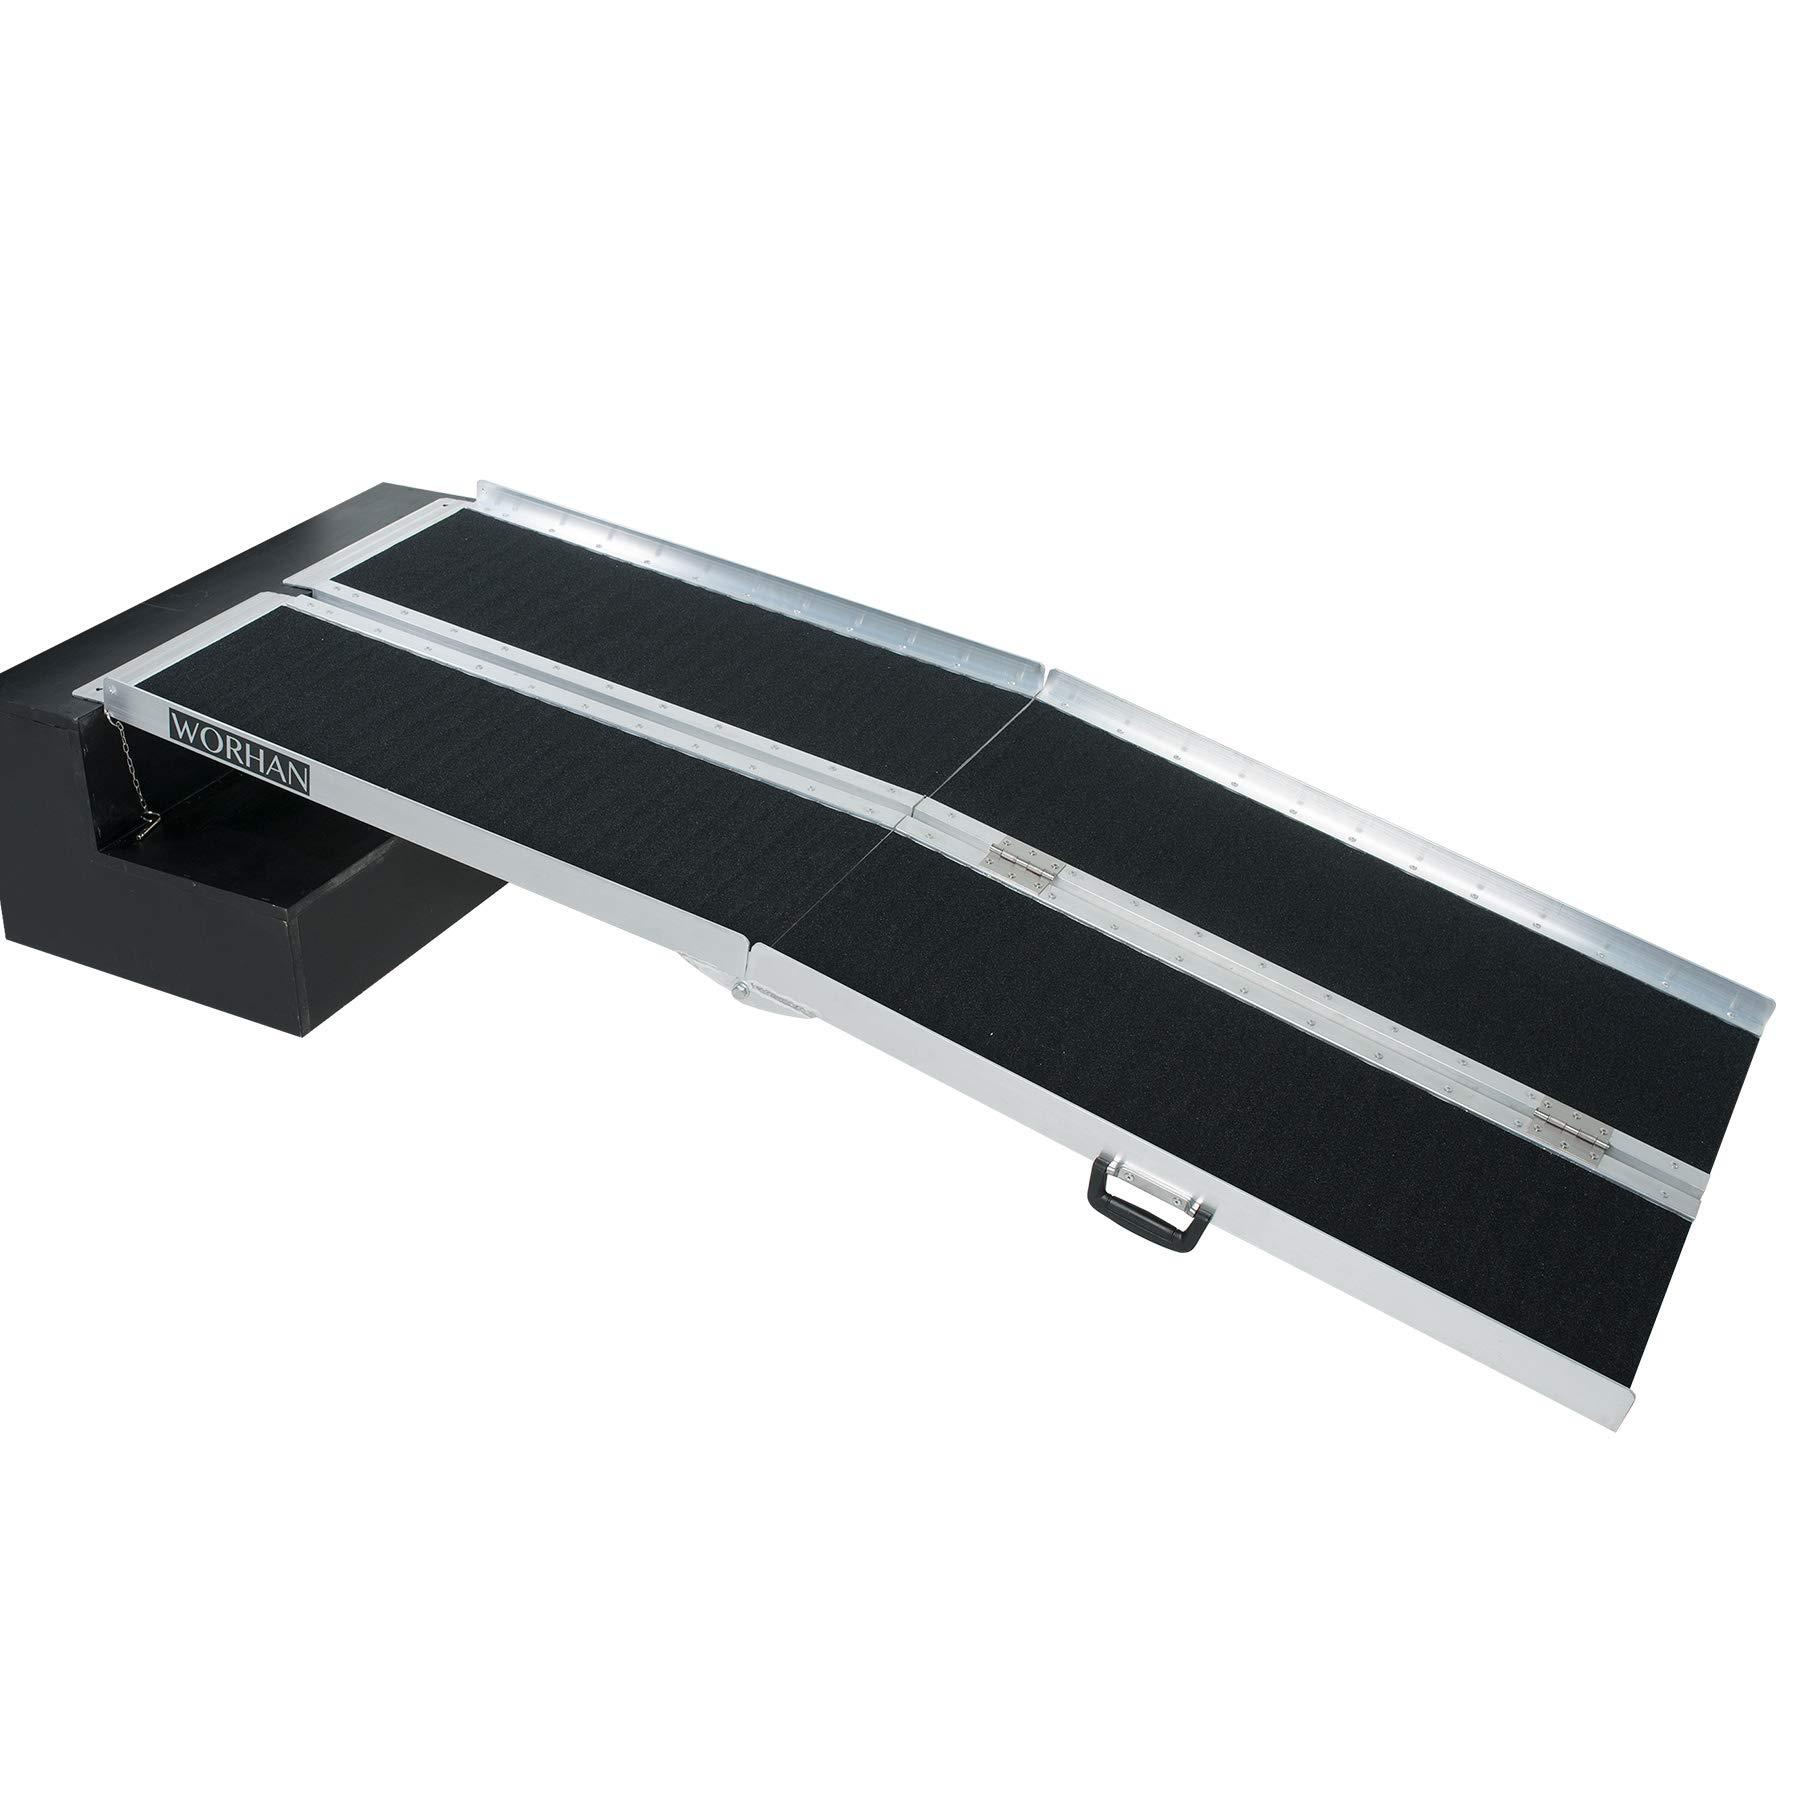 WORHAN® 1.83m Rampa Plegable Carga Silla de Ruedas Discapacitado Movilidad Aluminio Anodizado Modelo de